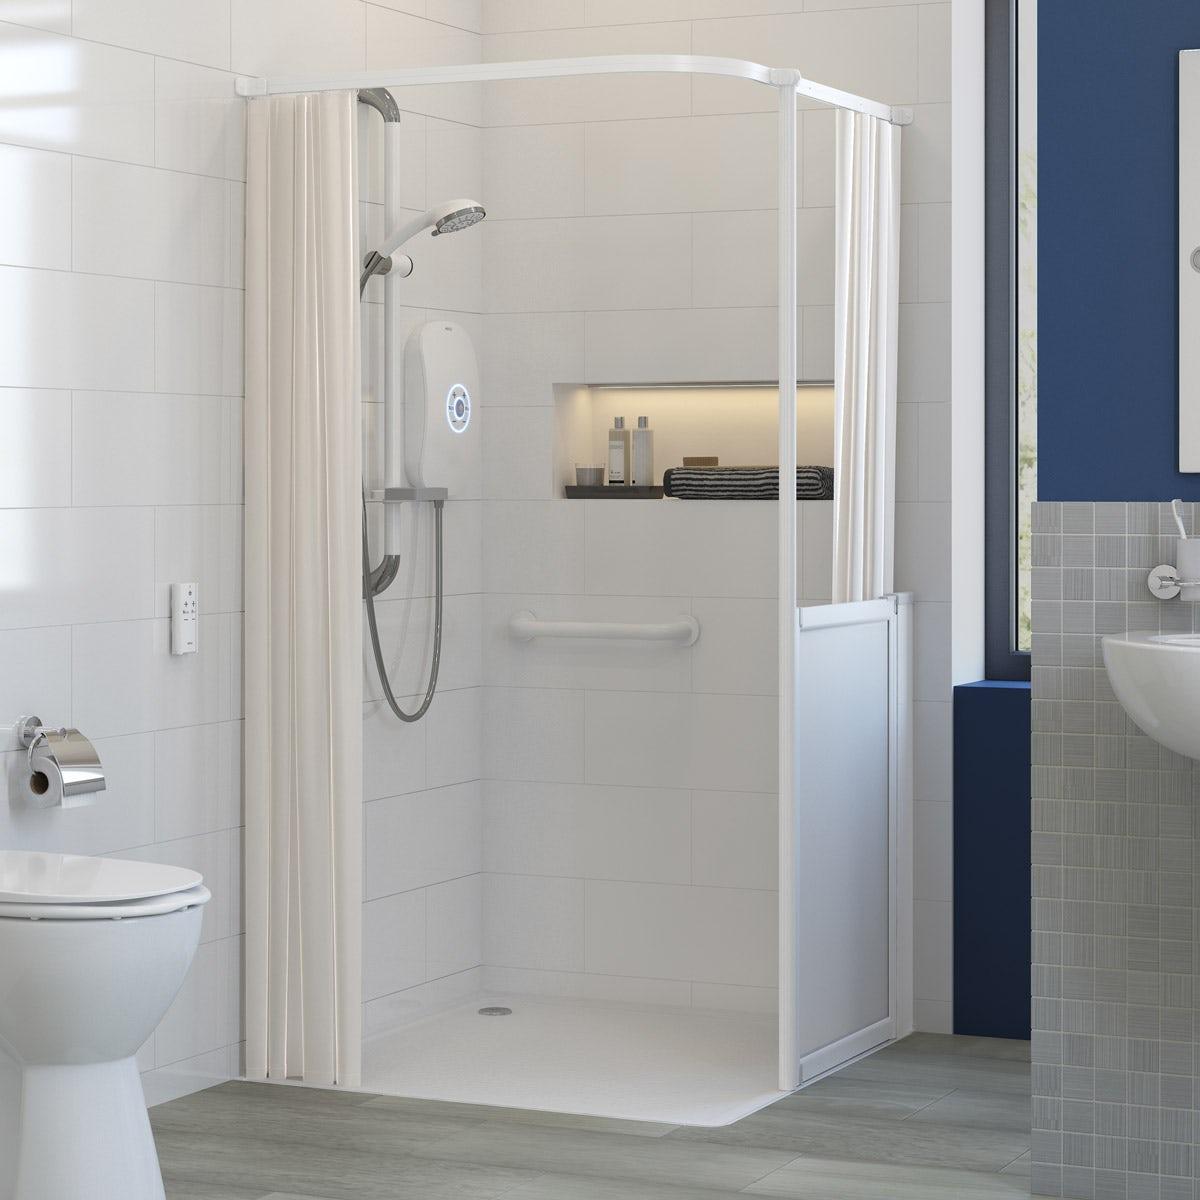 AKW Shower curtain 1800 x 1800